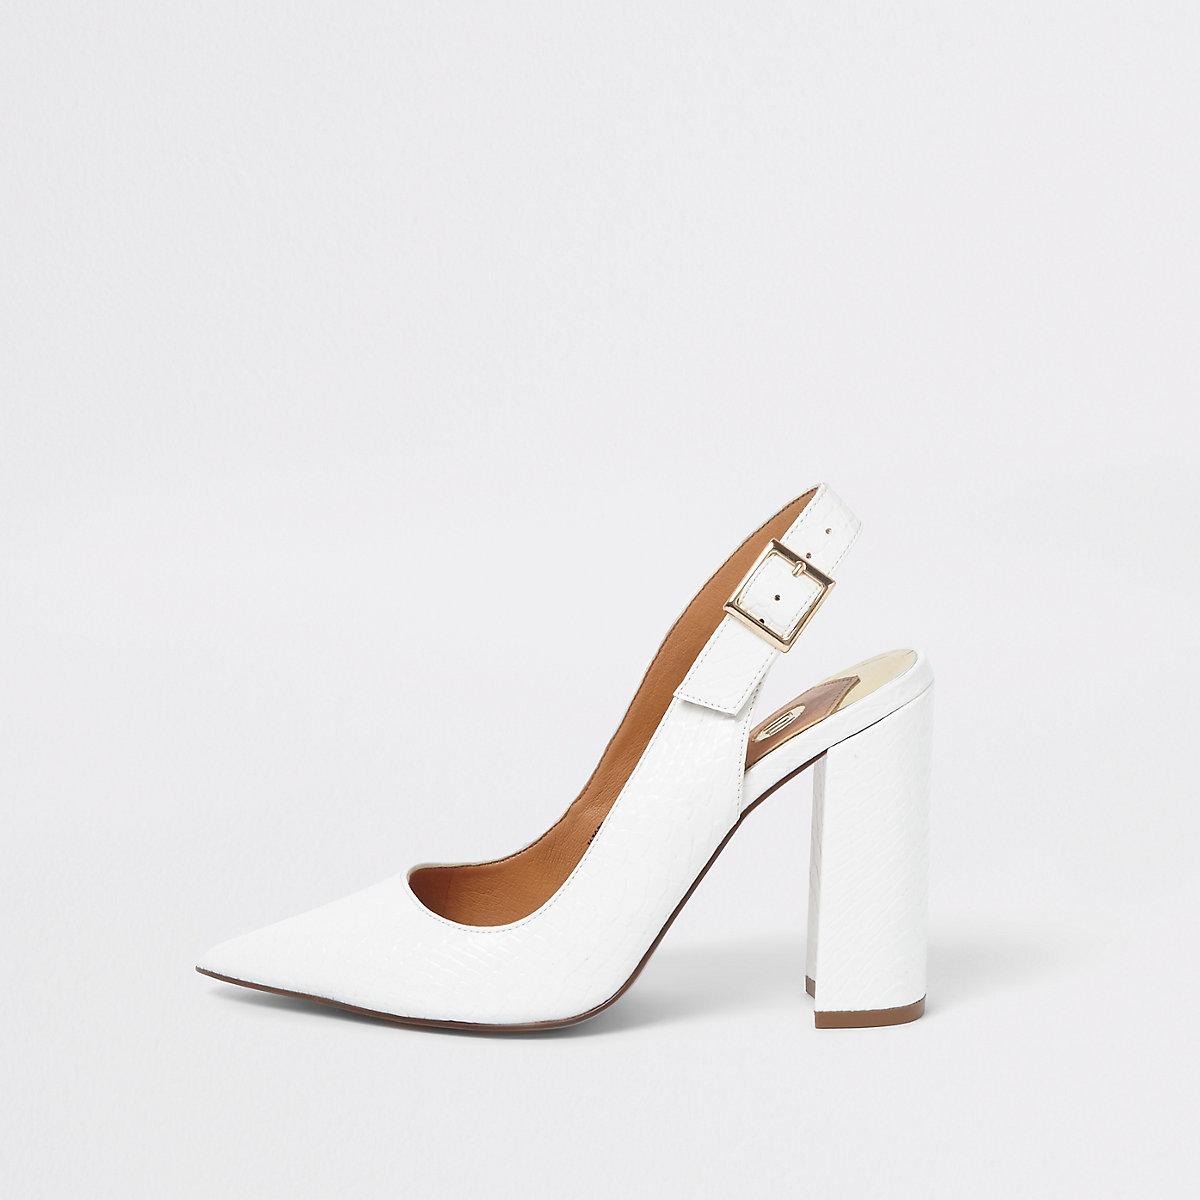 White croc block heel sling back pumps